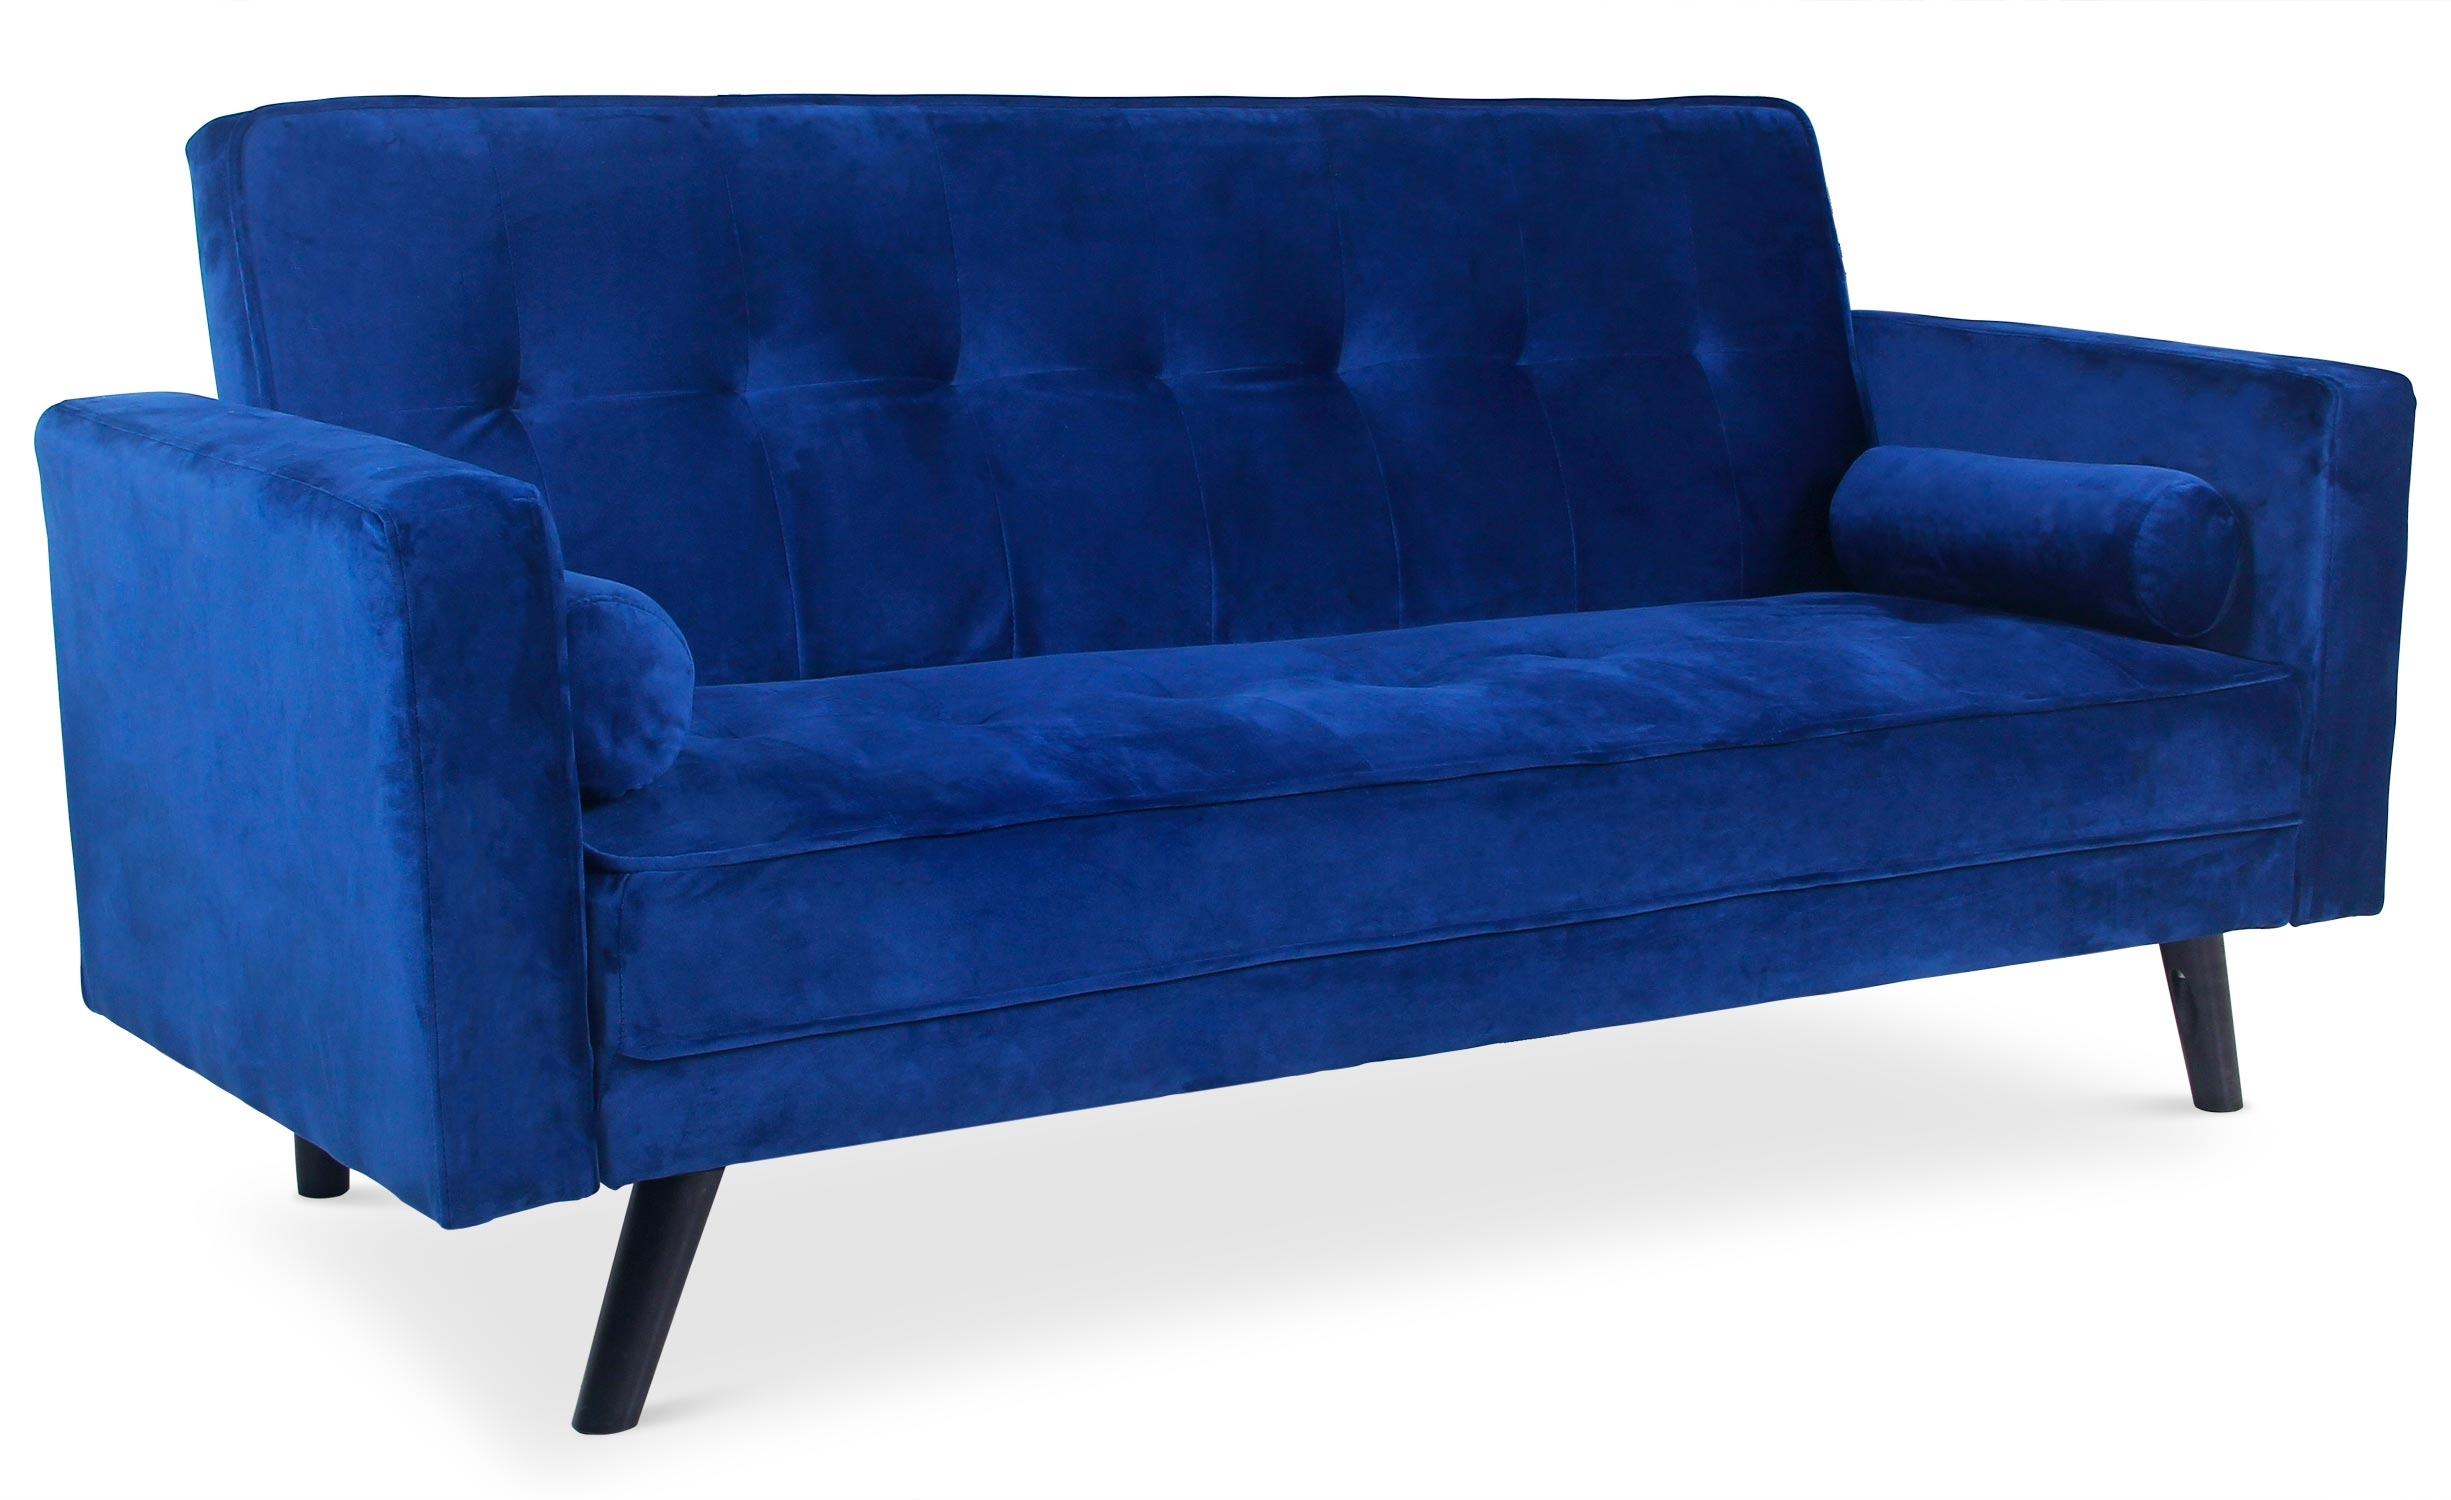 Canapé convertible clic-clac scandinave Slow Velours Bleu